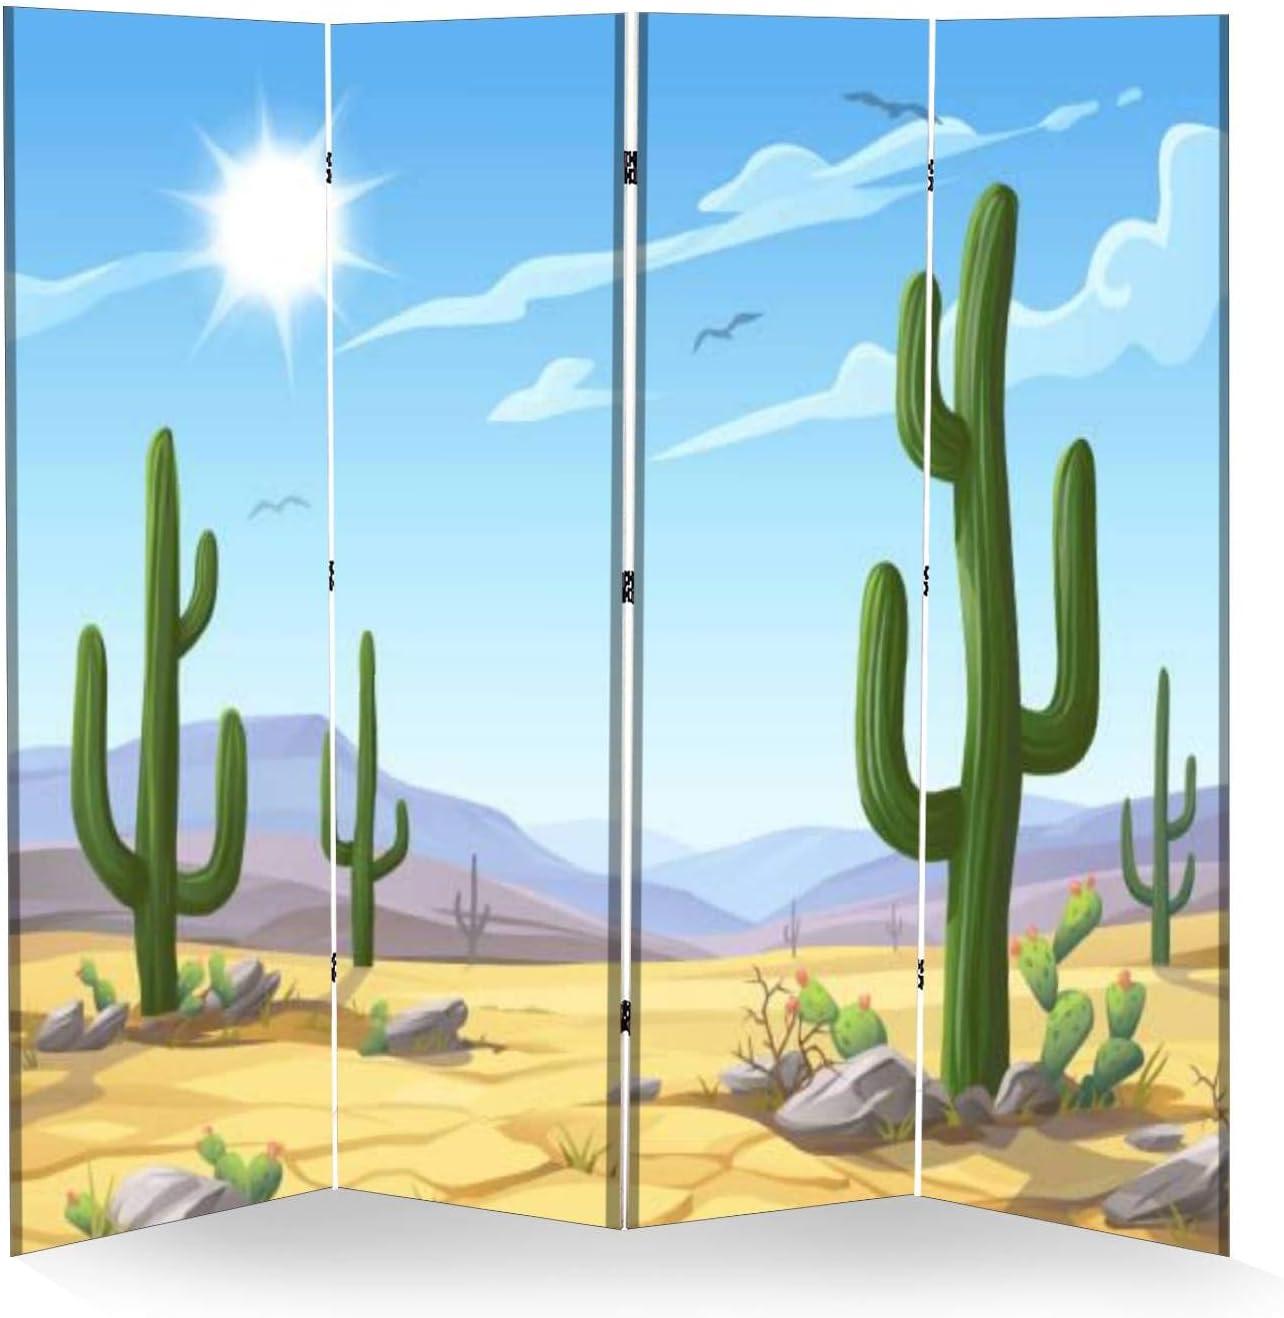 4 Panel Wall San Francisco latest Mall Divider Desert Stock Landscape Folding Illustration